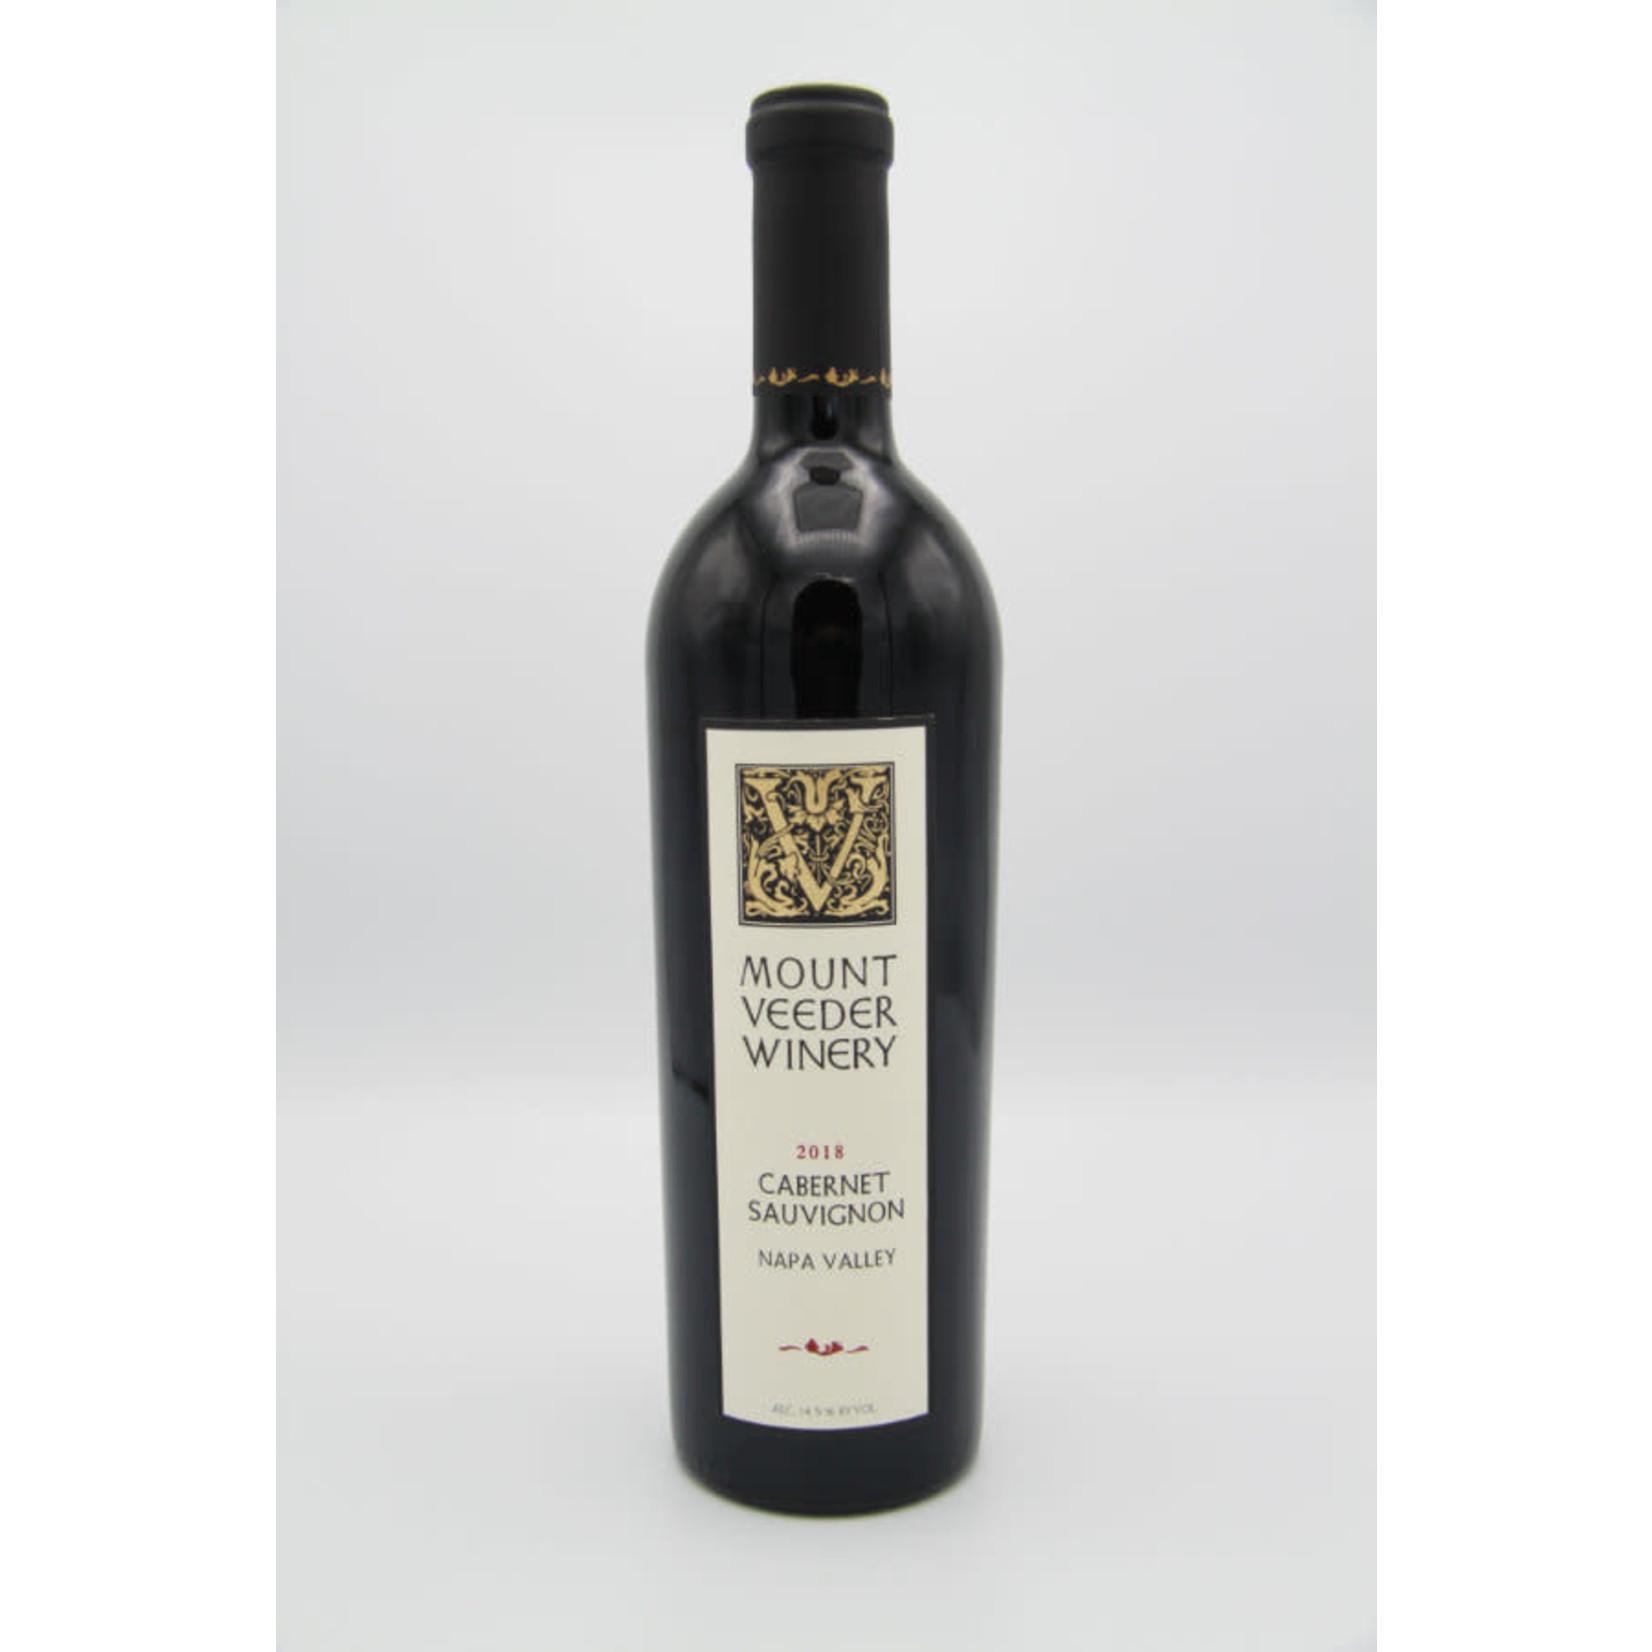 2018 Mount Veeder Winery Cabernet Sauvignon